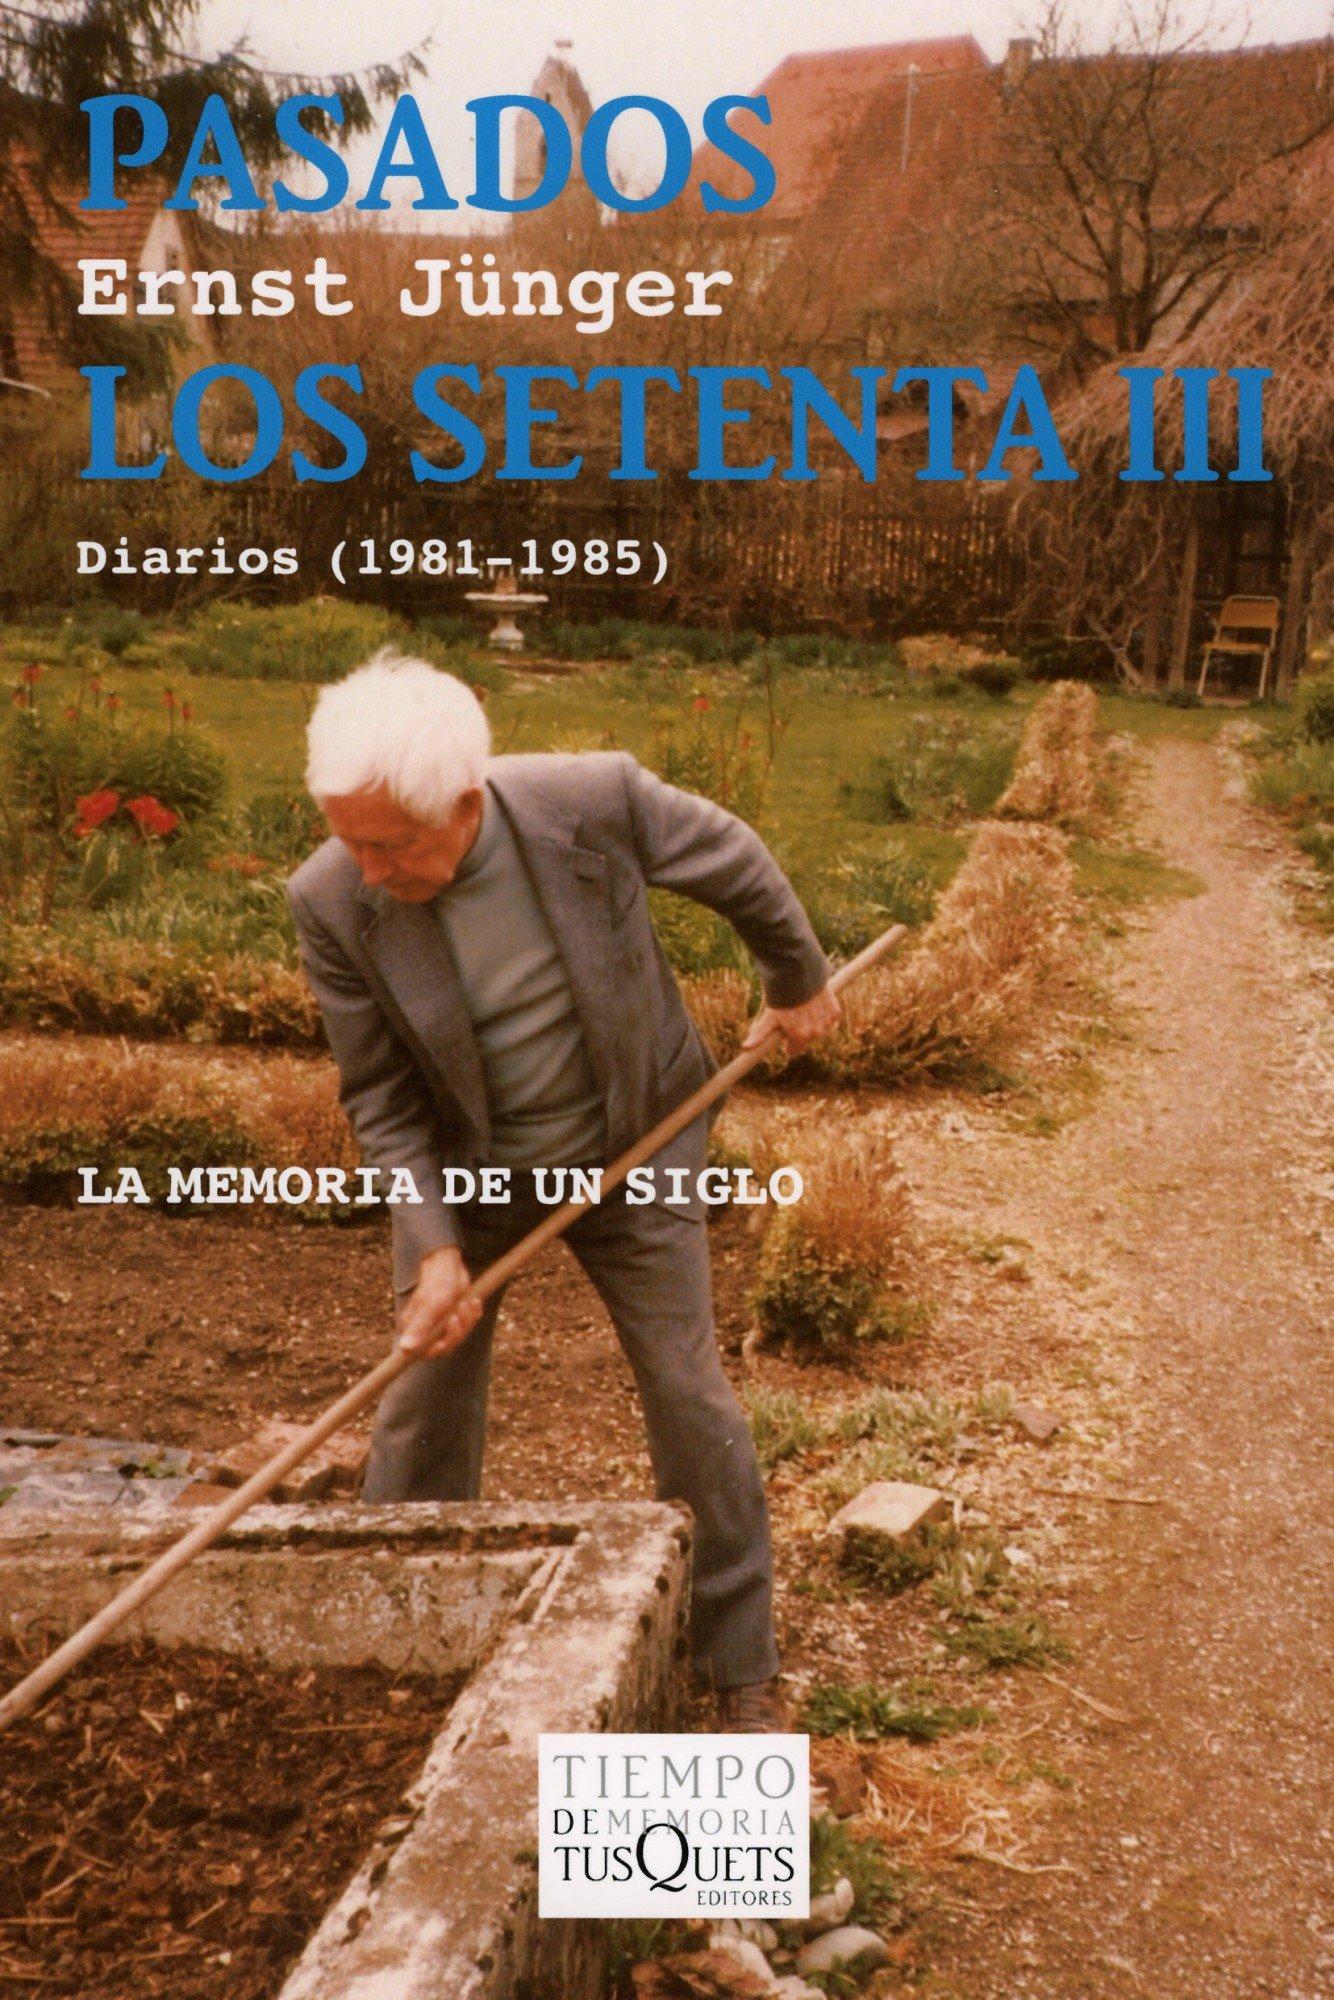 Pasados los setenta III: Diarios (1981-1985) (Spanish Edition): Ernst Jünger: 9788483830048: Amazon.com: Books